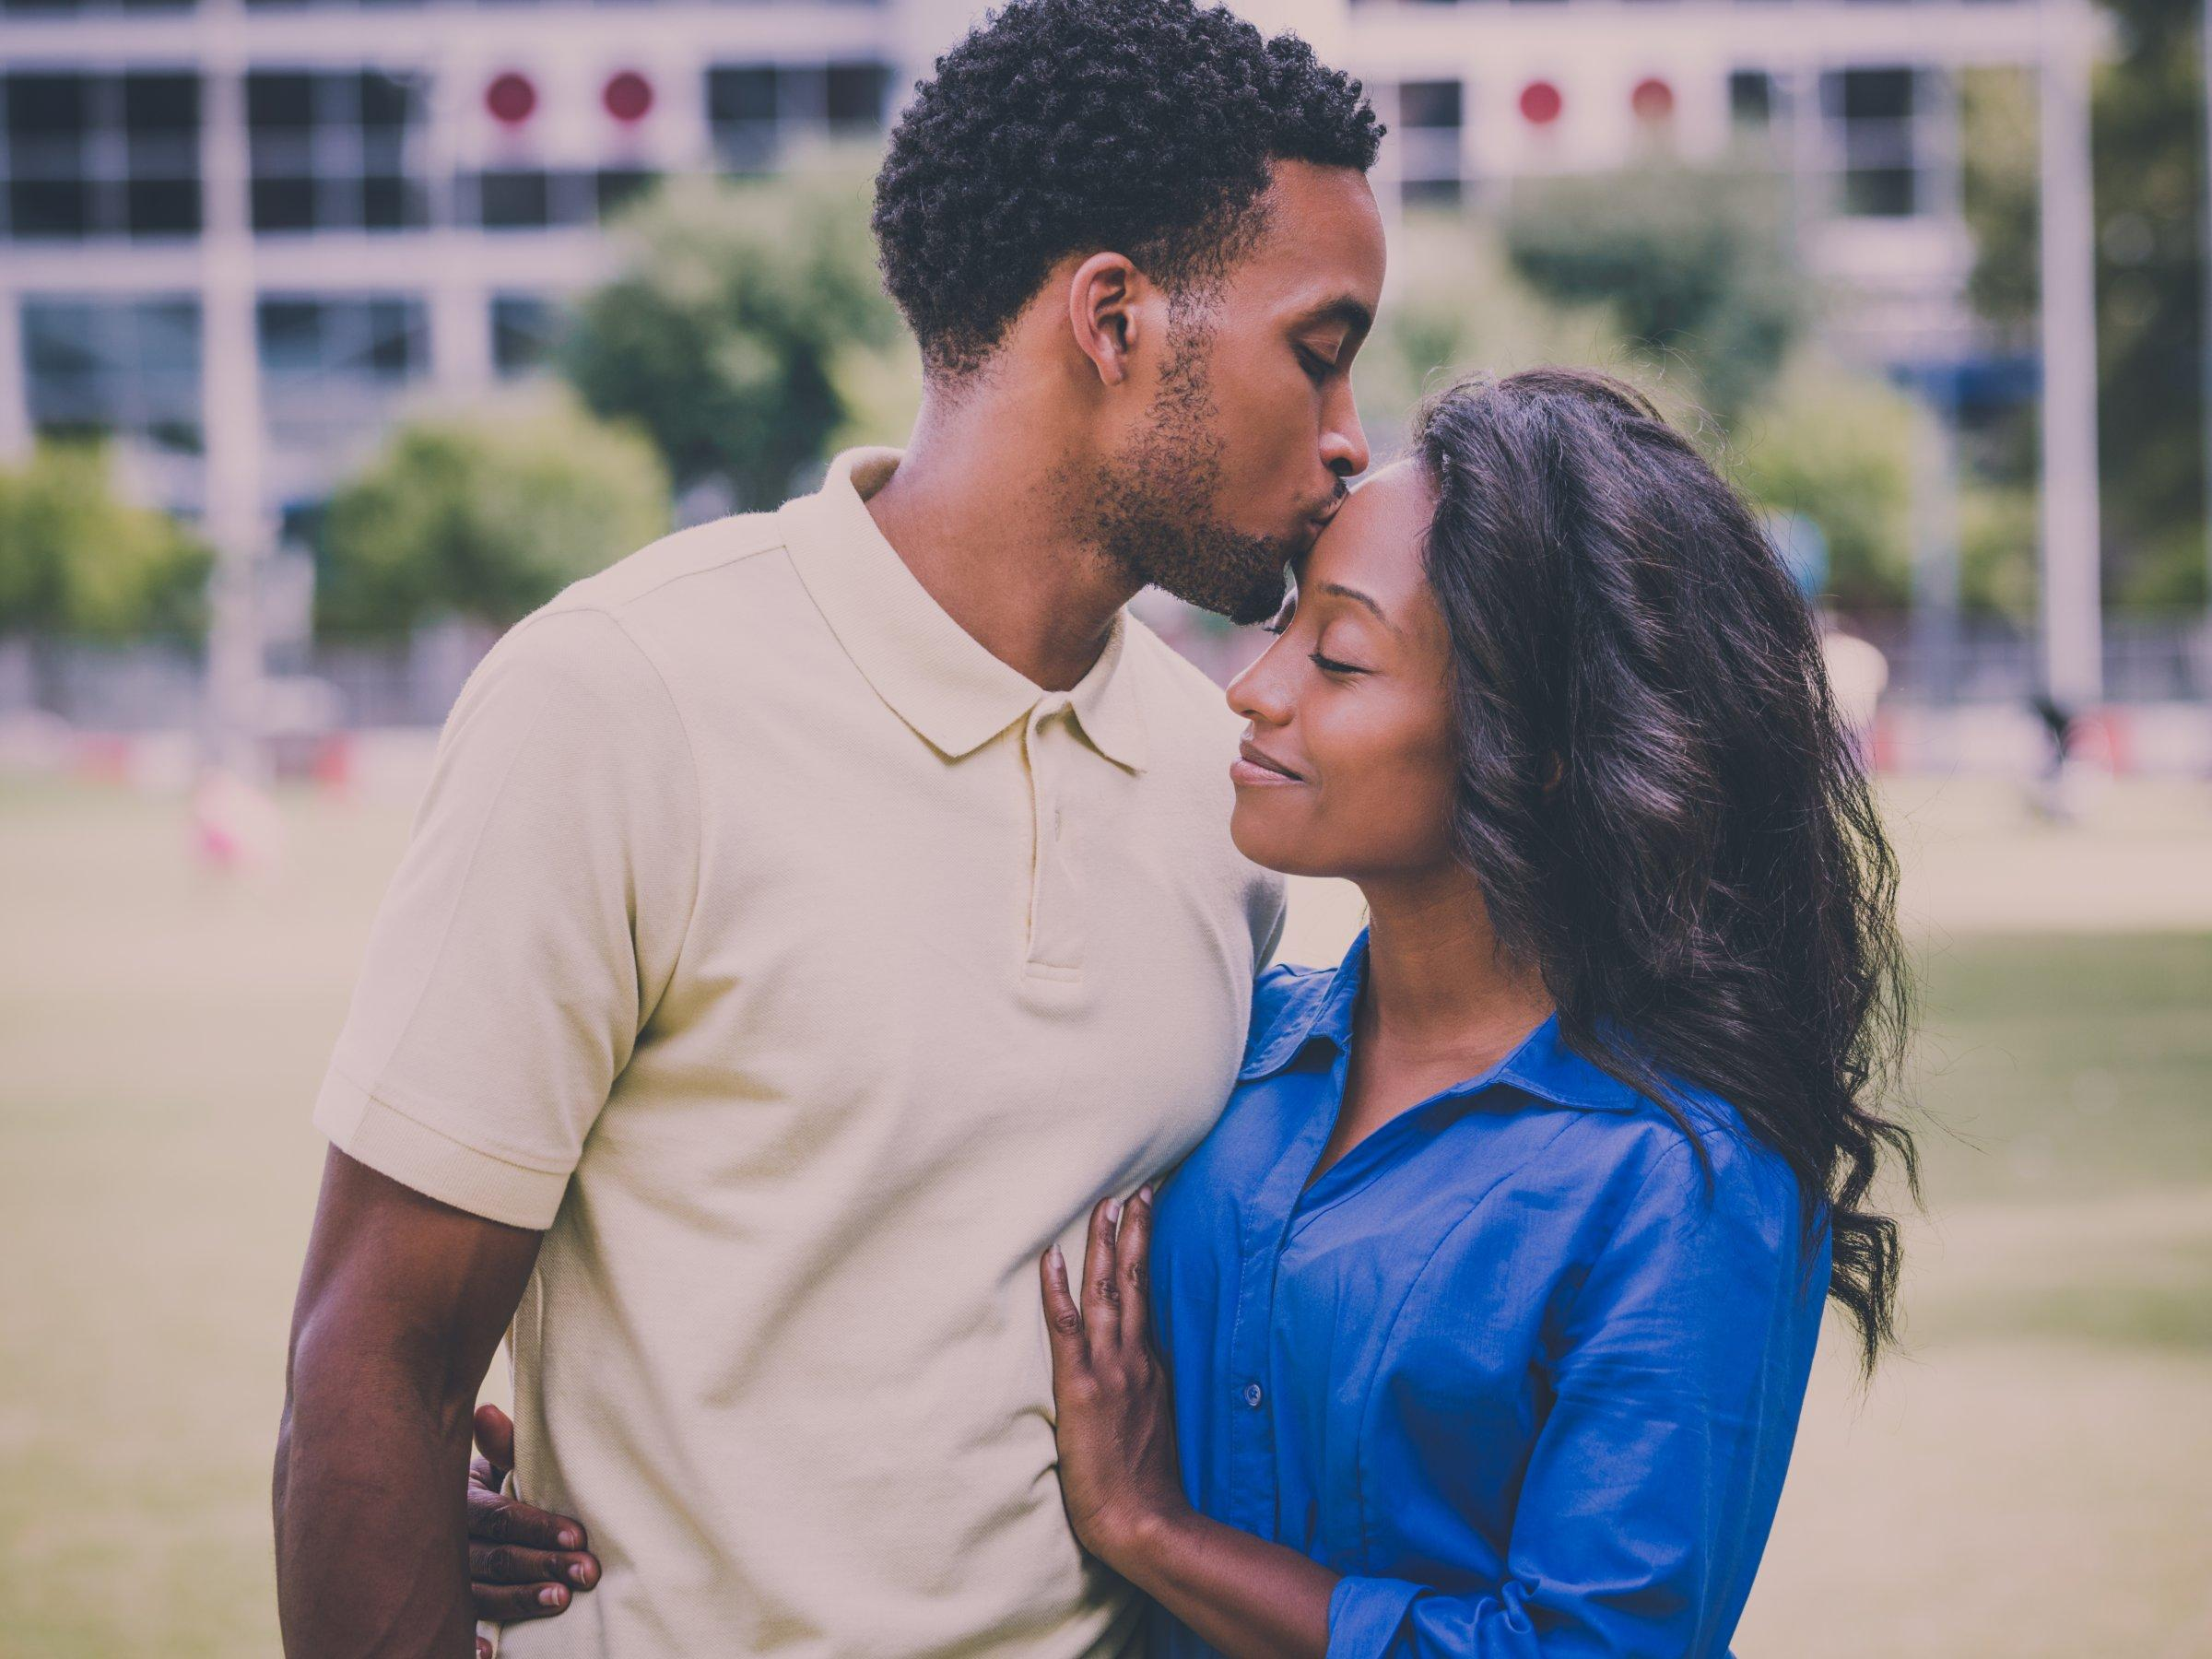 Genç yaşta doğru evlilik kararı alınır mı